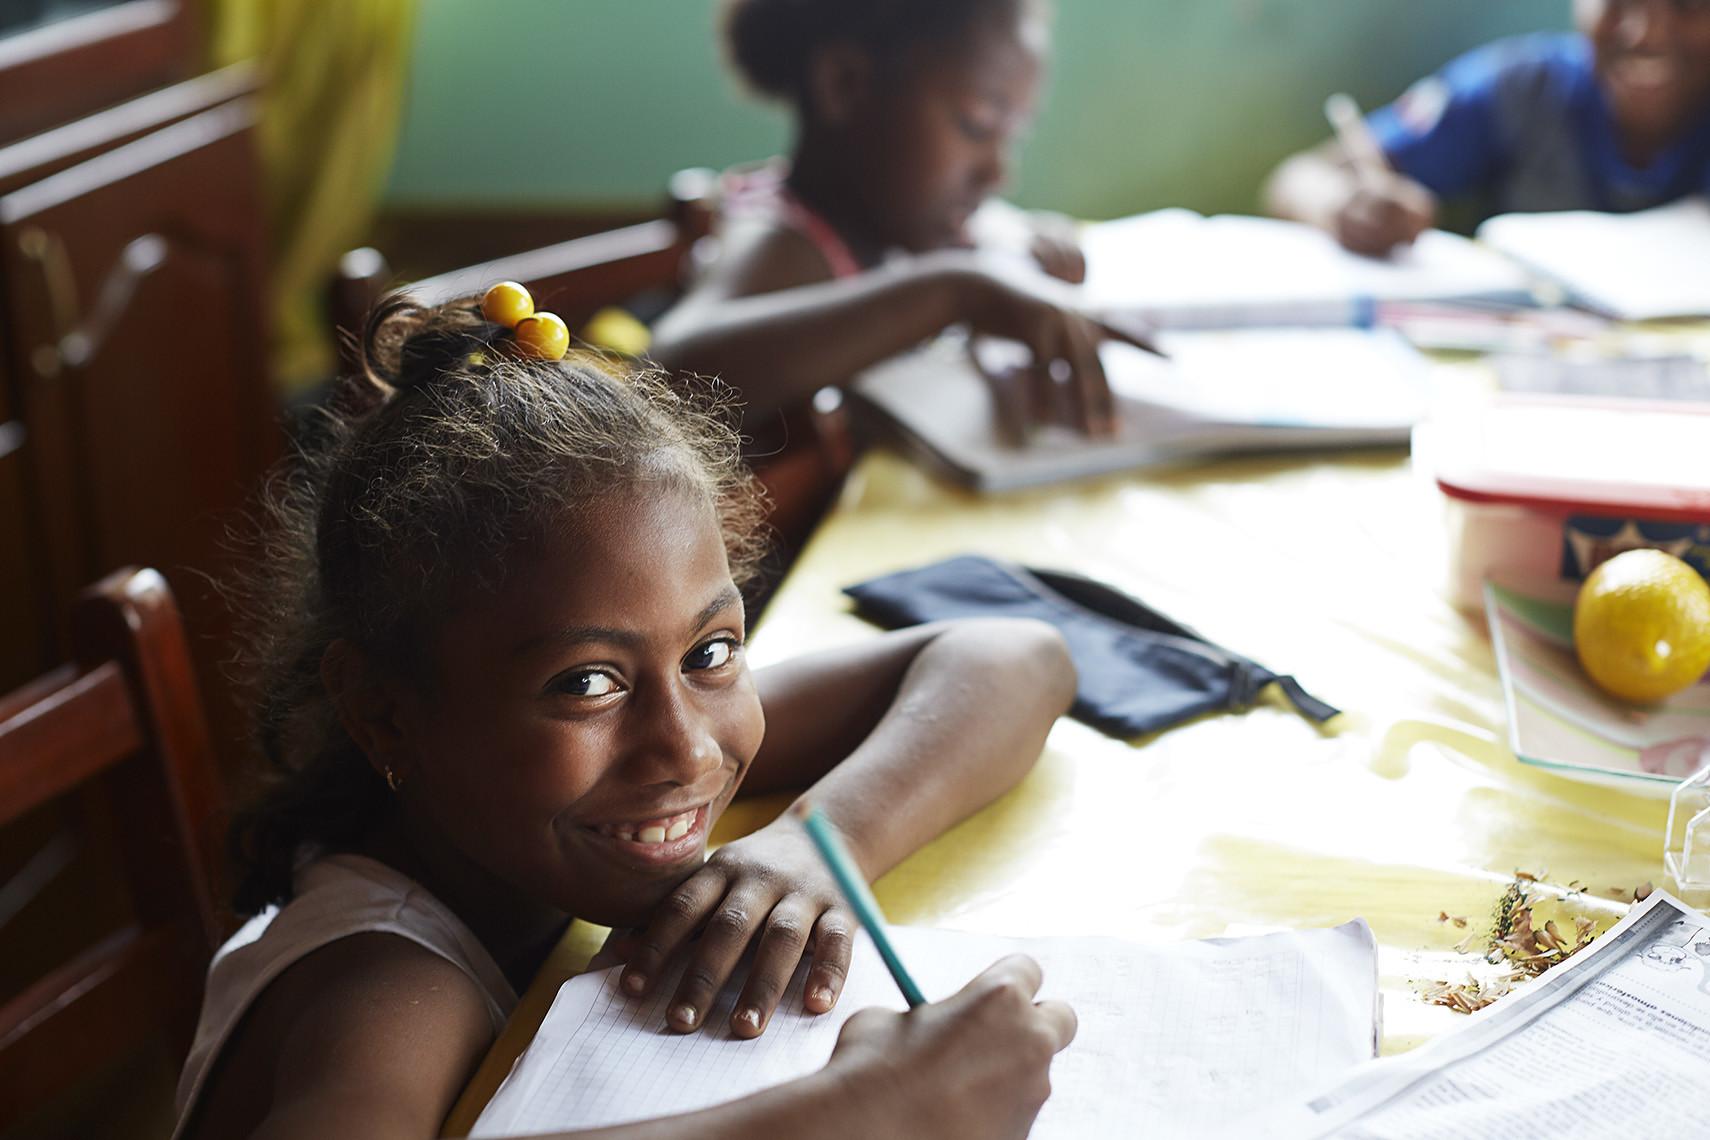 Ecuador_Esmeraldas2024_Childrens' Villages.jpg